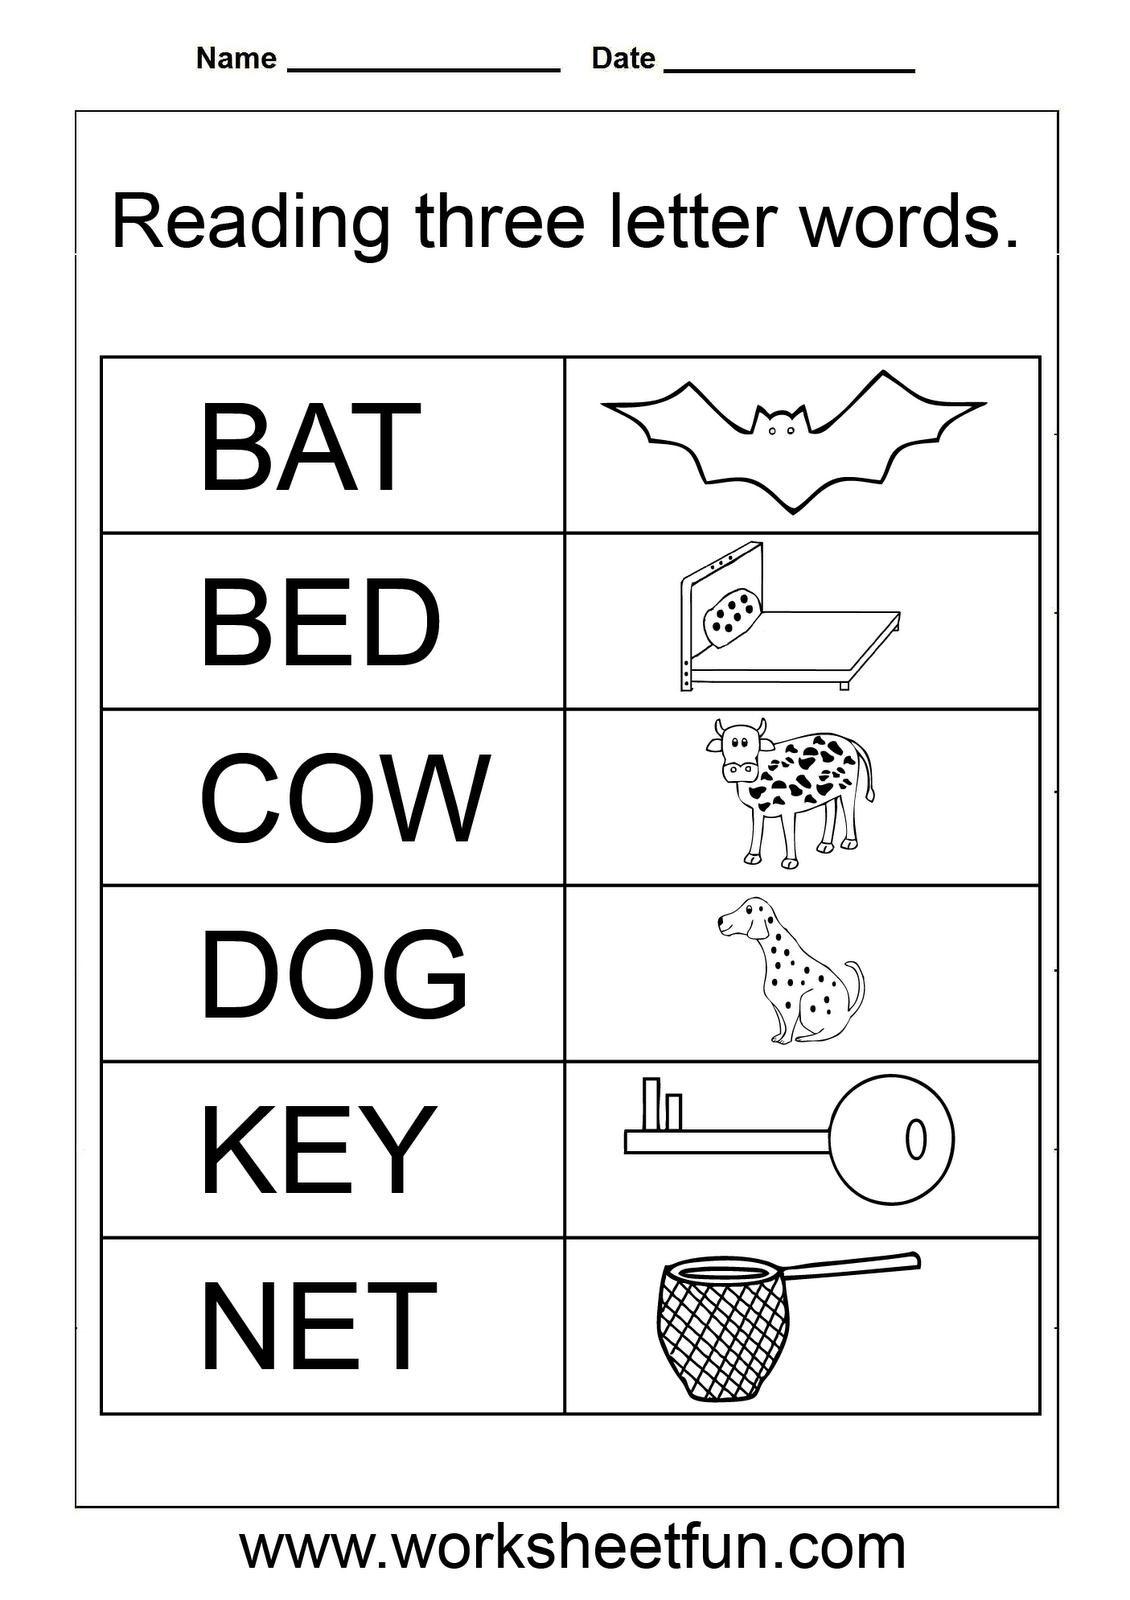 Simple Words - Worksheet | Homeschooling: Reading & Grammar - Free Printable English Reading Worksheets For Kindergarten